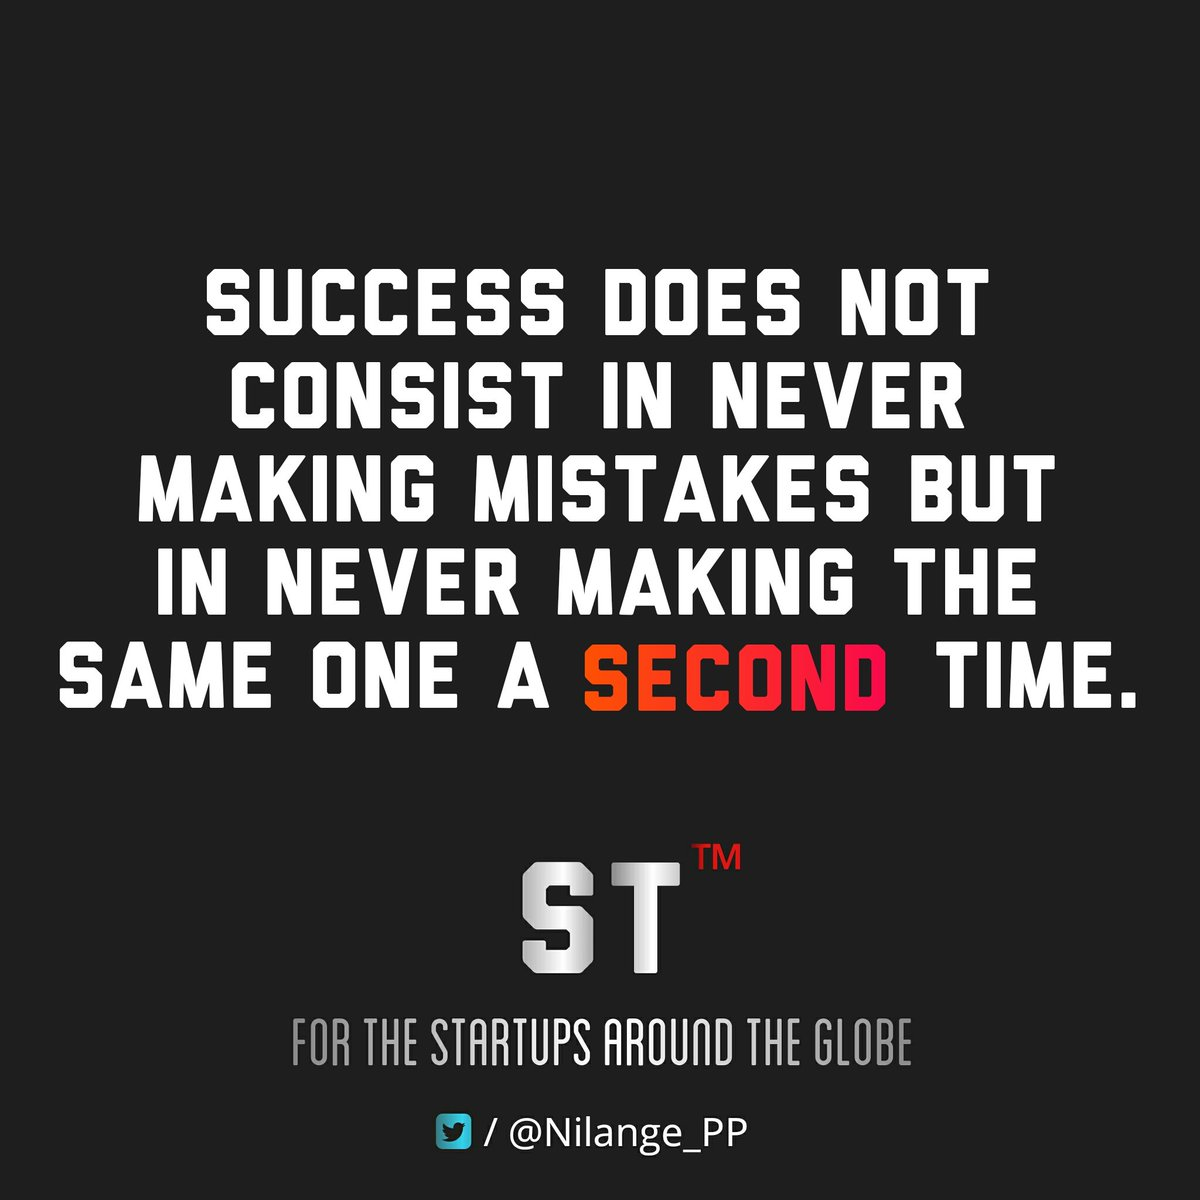 Please Note.... #startups #MakeYourOwnLane #Entrepreneur #defstar5 #mpgvip #spdc #smm #dji... by #StartupsBeat<br>http://pic.twitter.com/tTcaQr0etu